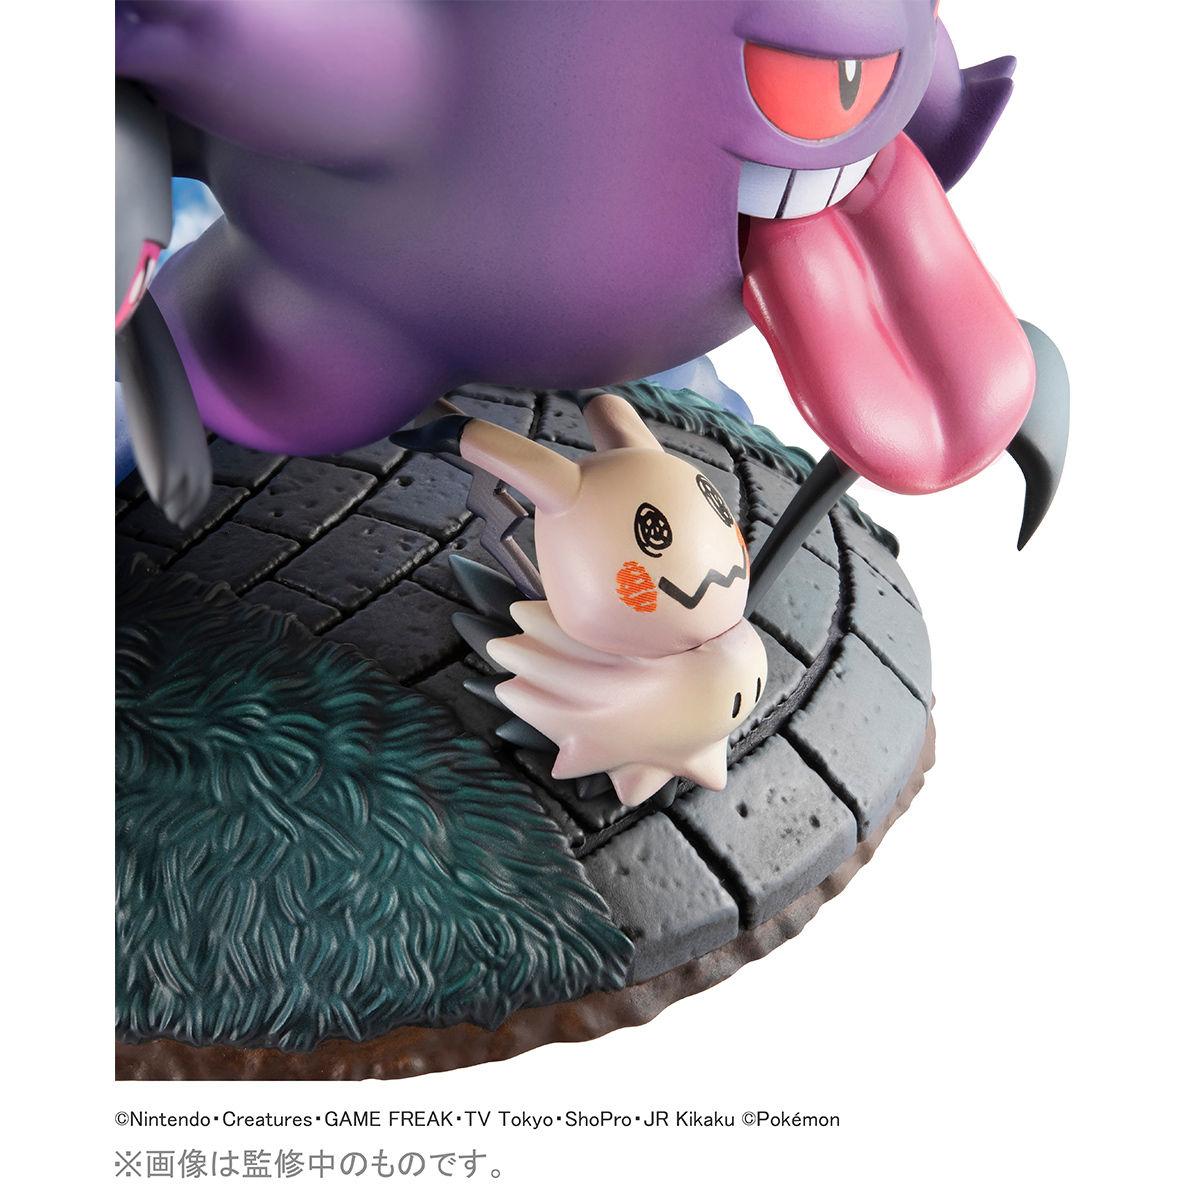 G.E.M.EXシリーズ『ゴーストタイプ大集合!』ポケットモンスター 完成品フィギュア-008